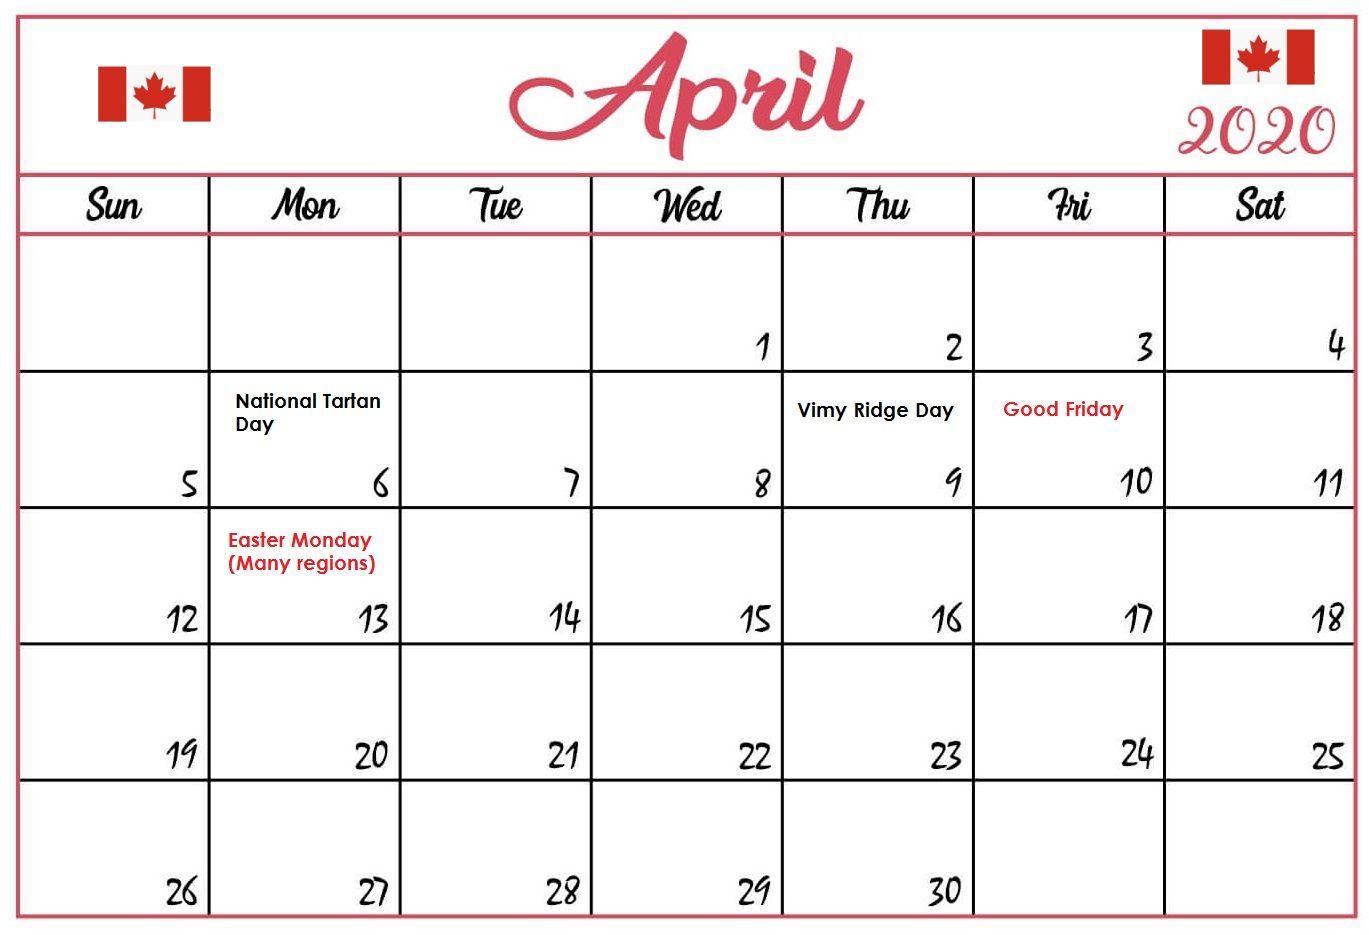 April 2020 Holidays Calendar in 2020 Holiday calendar